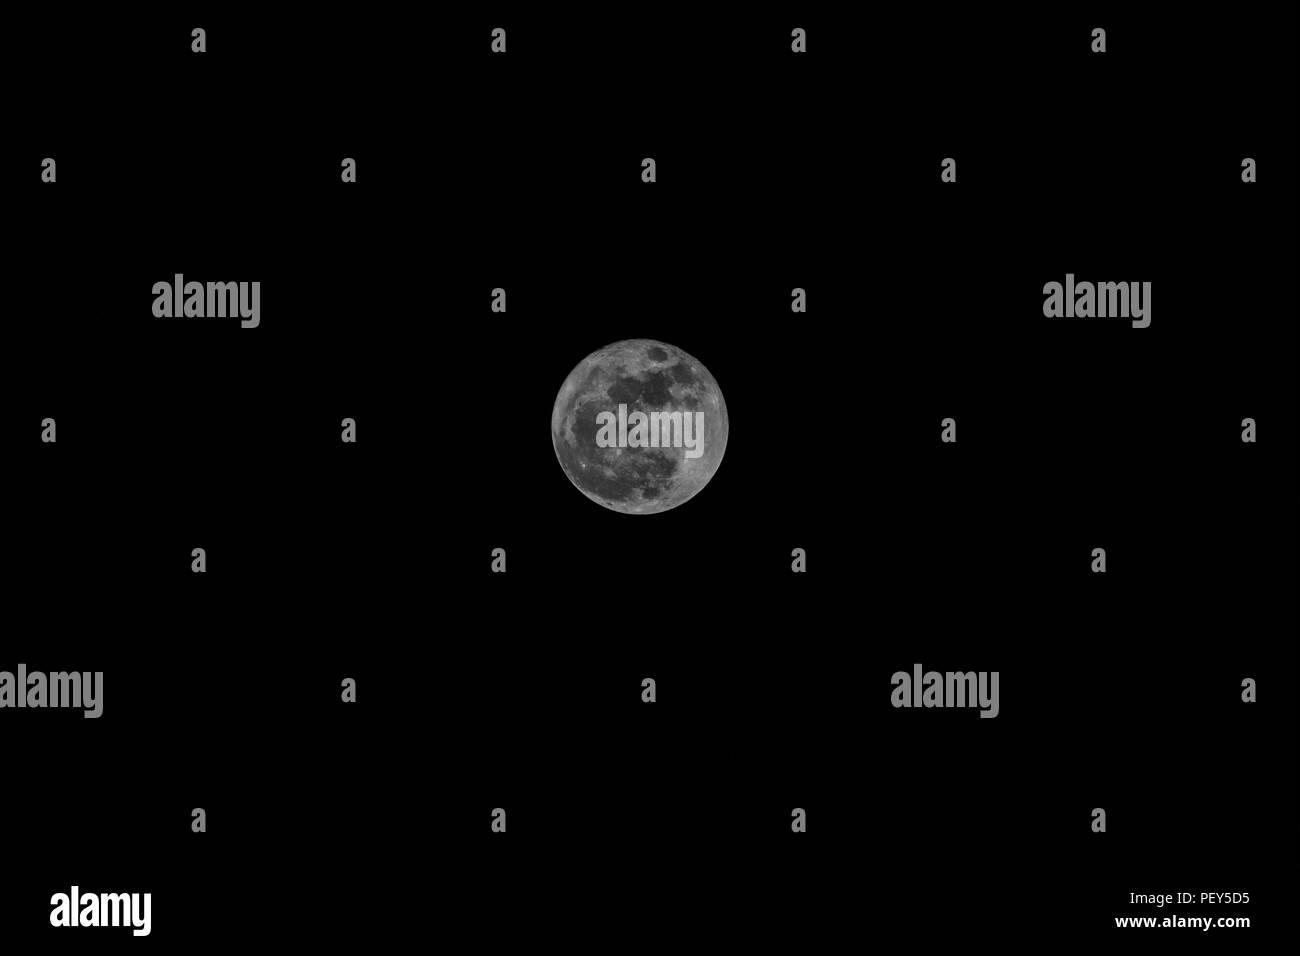 Extra Super Moon November 14, 2016 - Stock Image